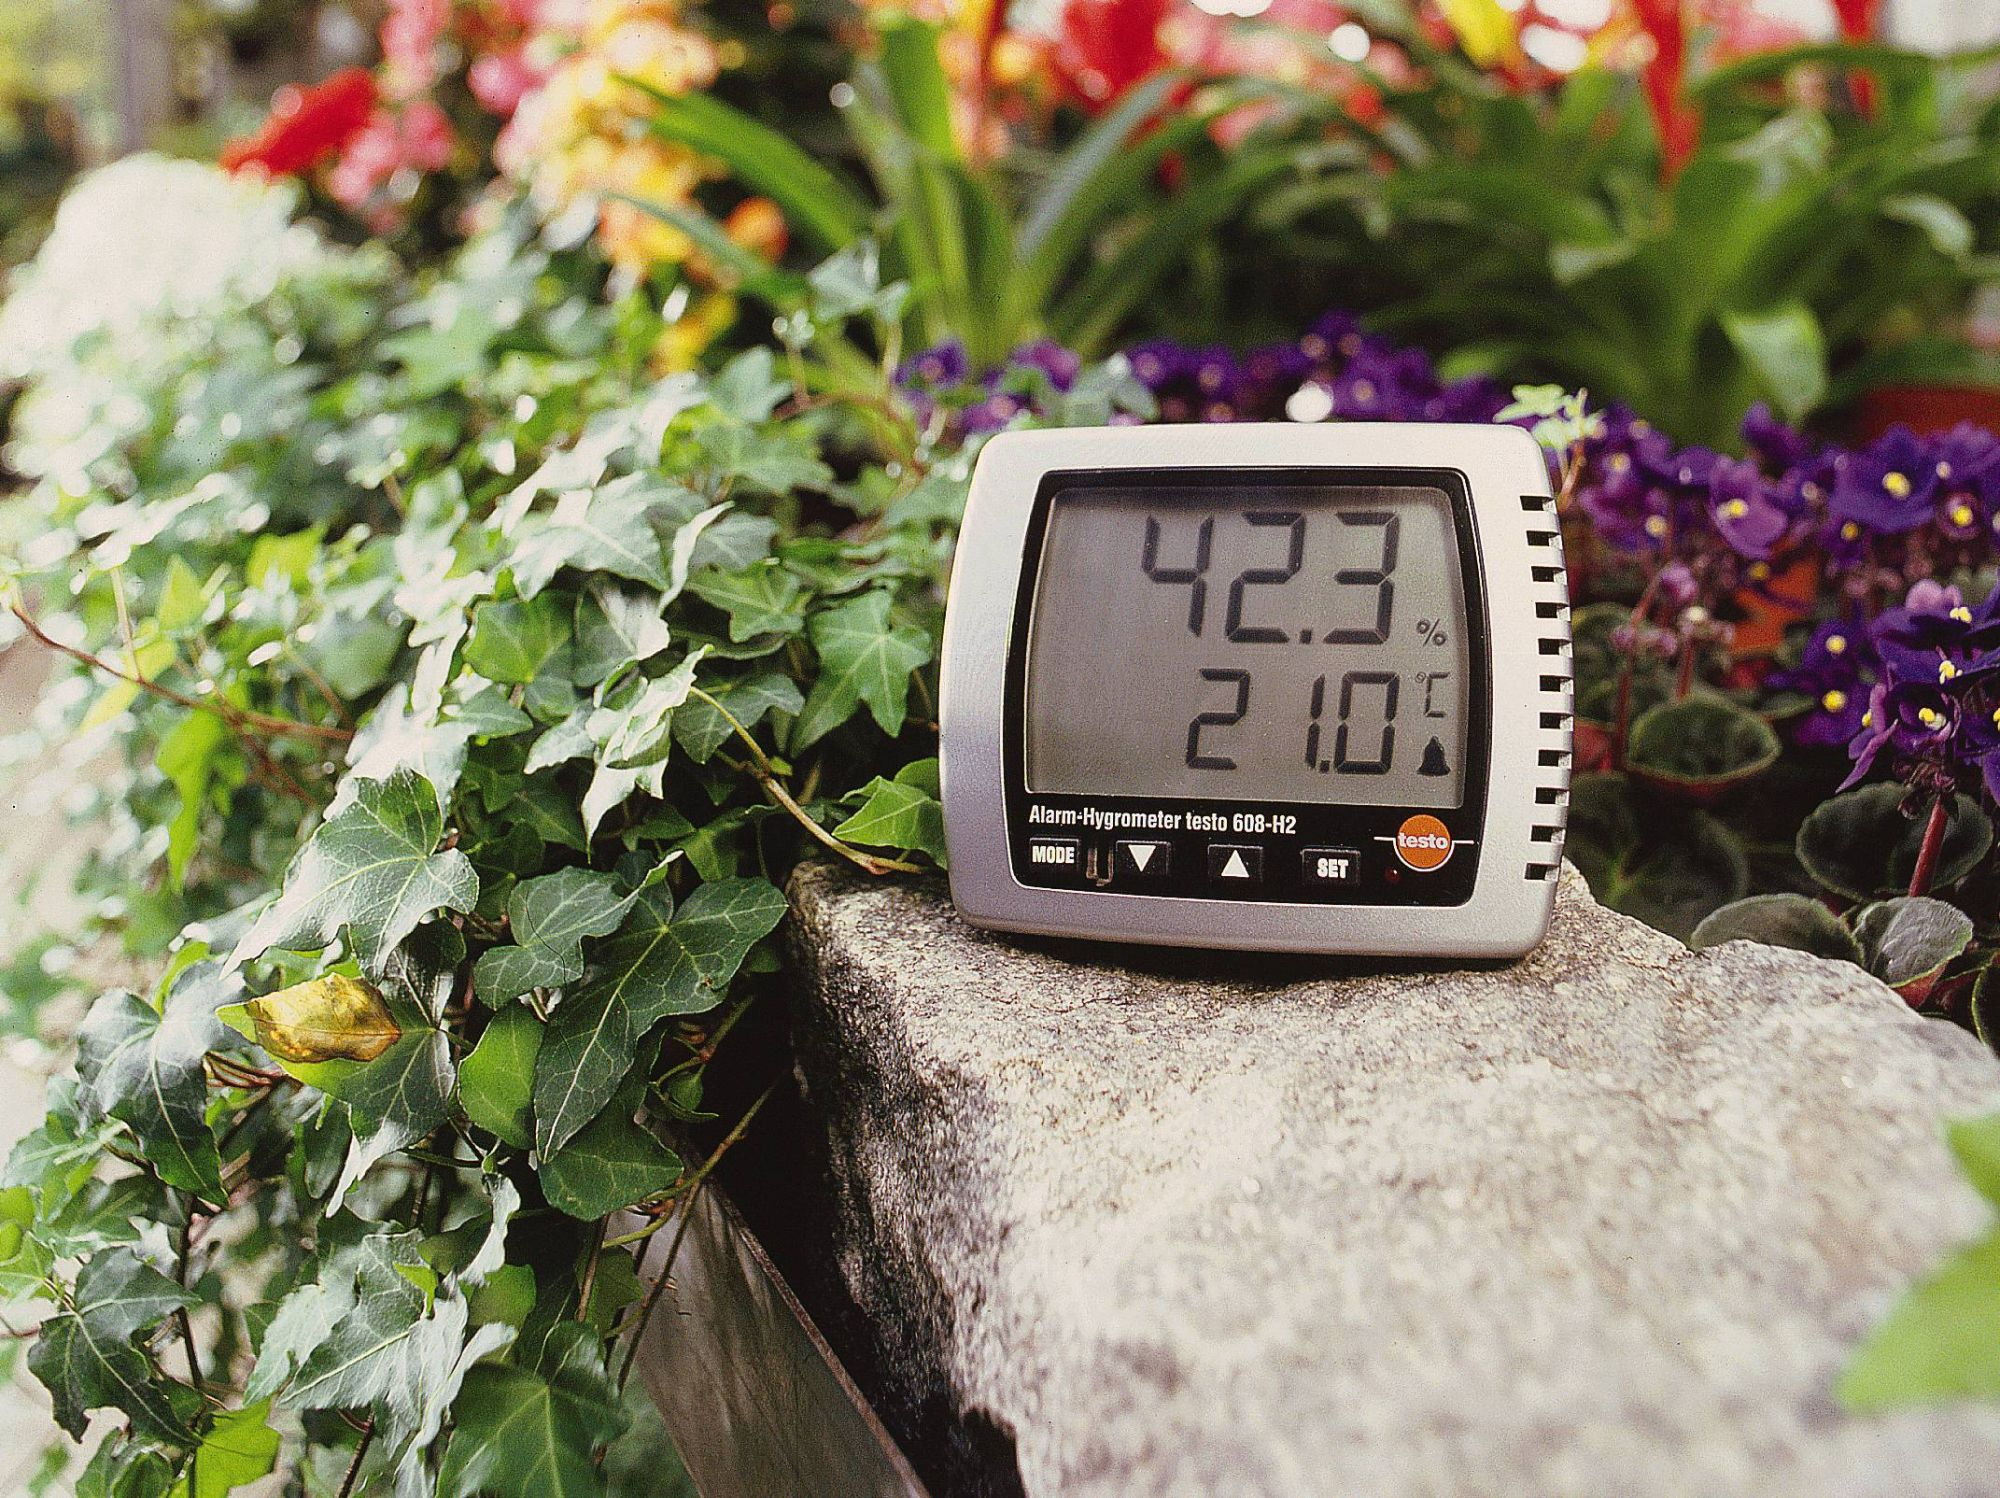 Thermohygrometer testo 608